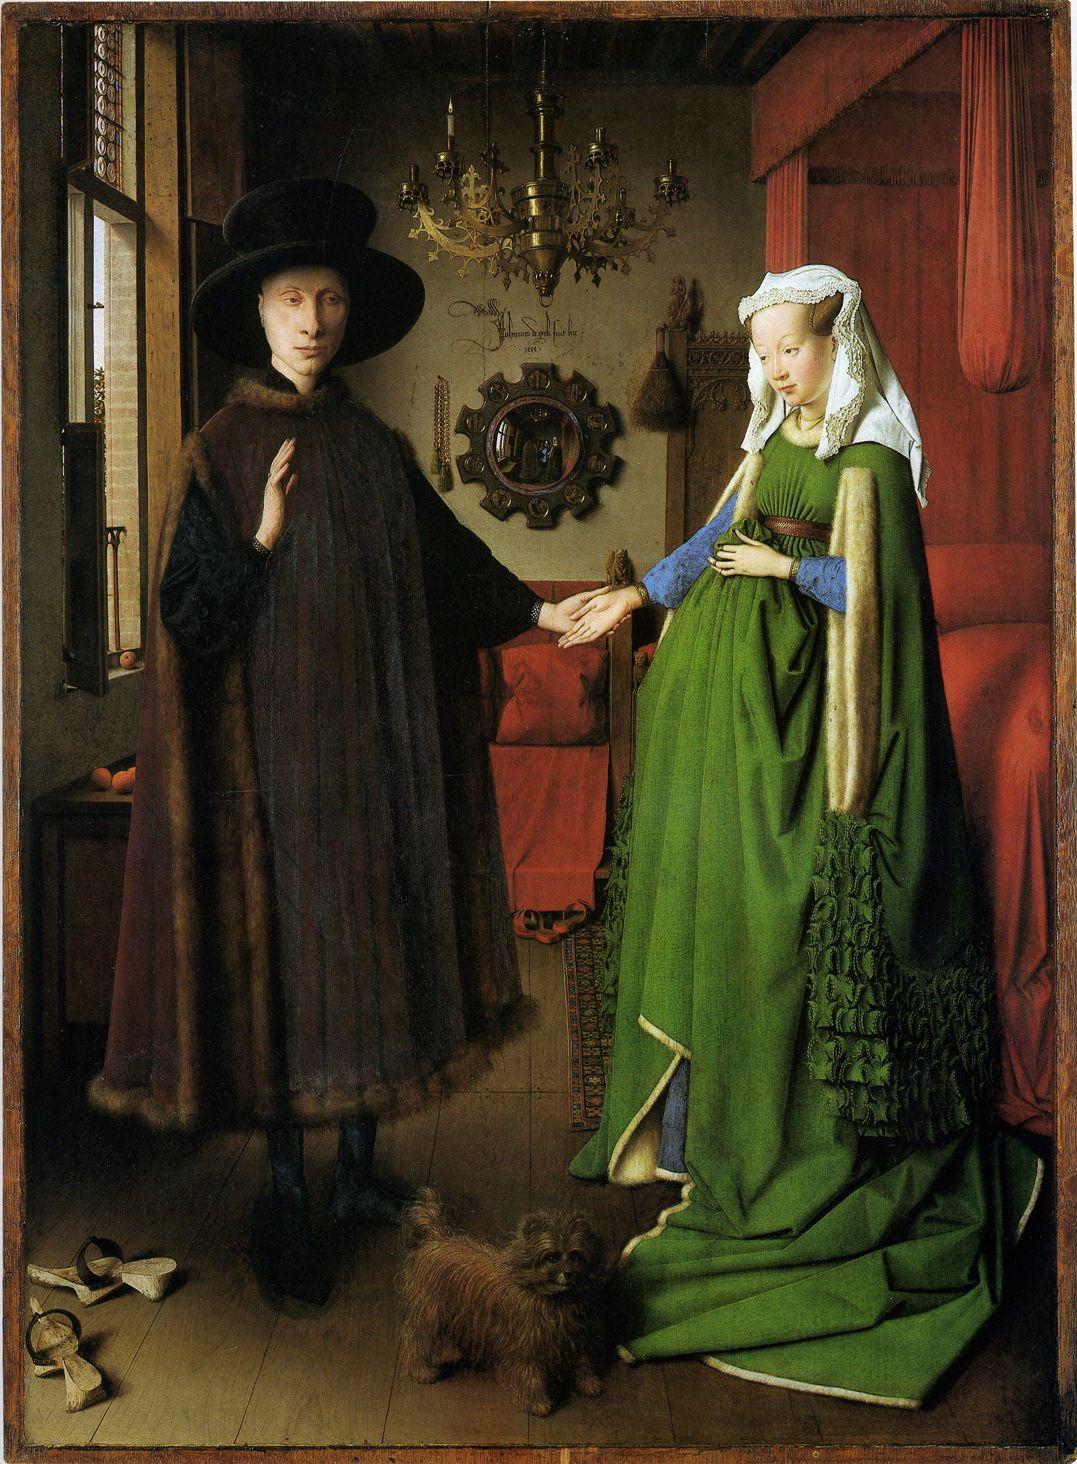 Jan Van Eyck (Belgium 1390-1441) / The Arnolfini Wedding Portrait (1434) The National Gallery, London / #PinturaFlamenca